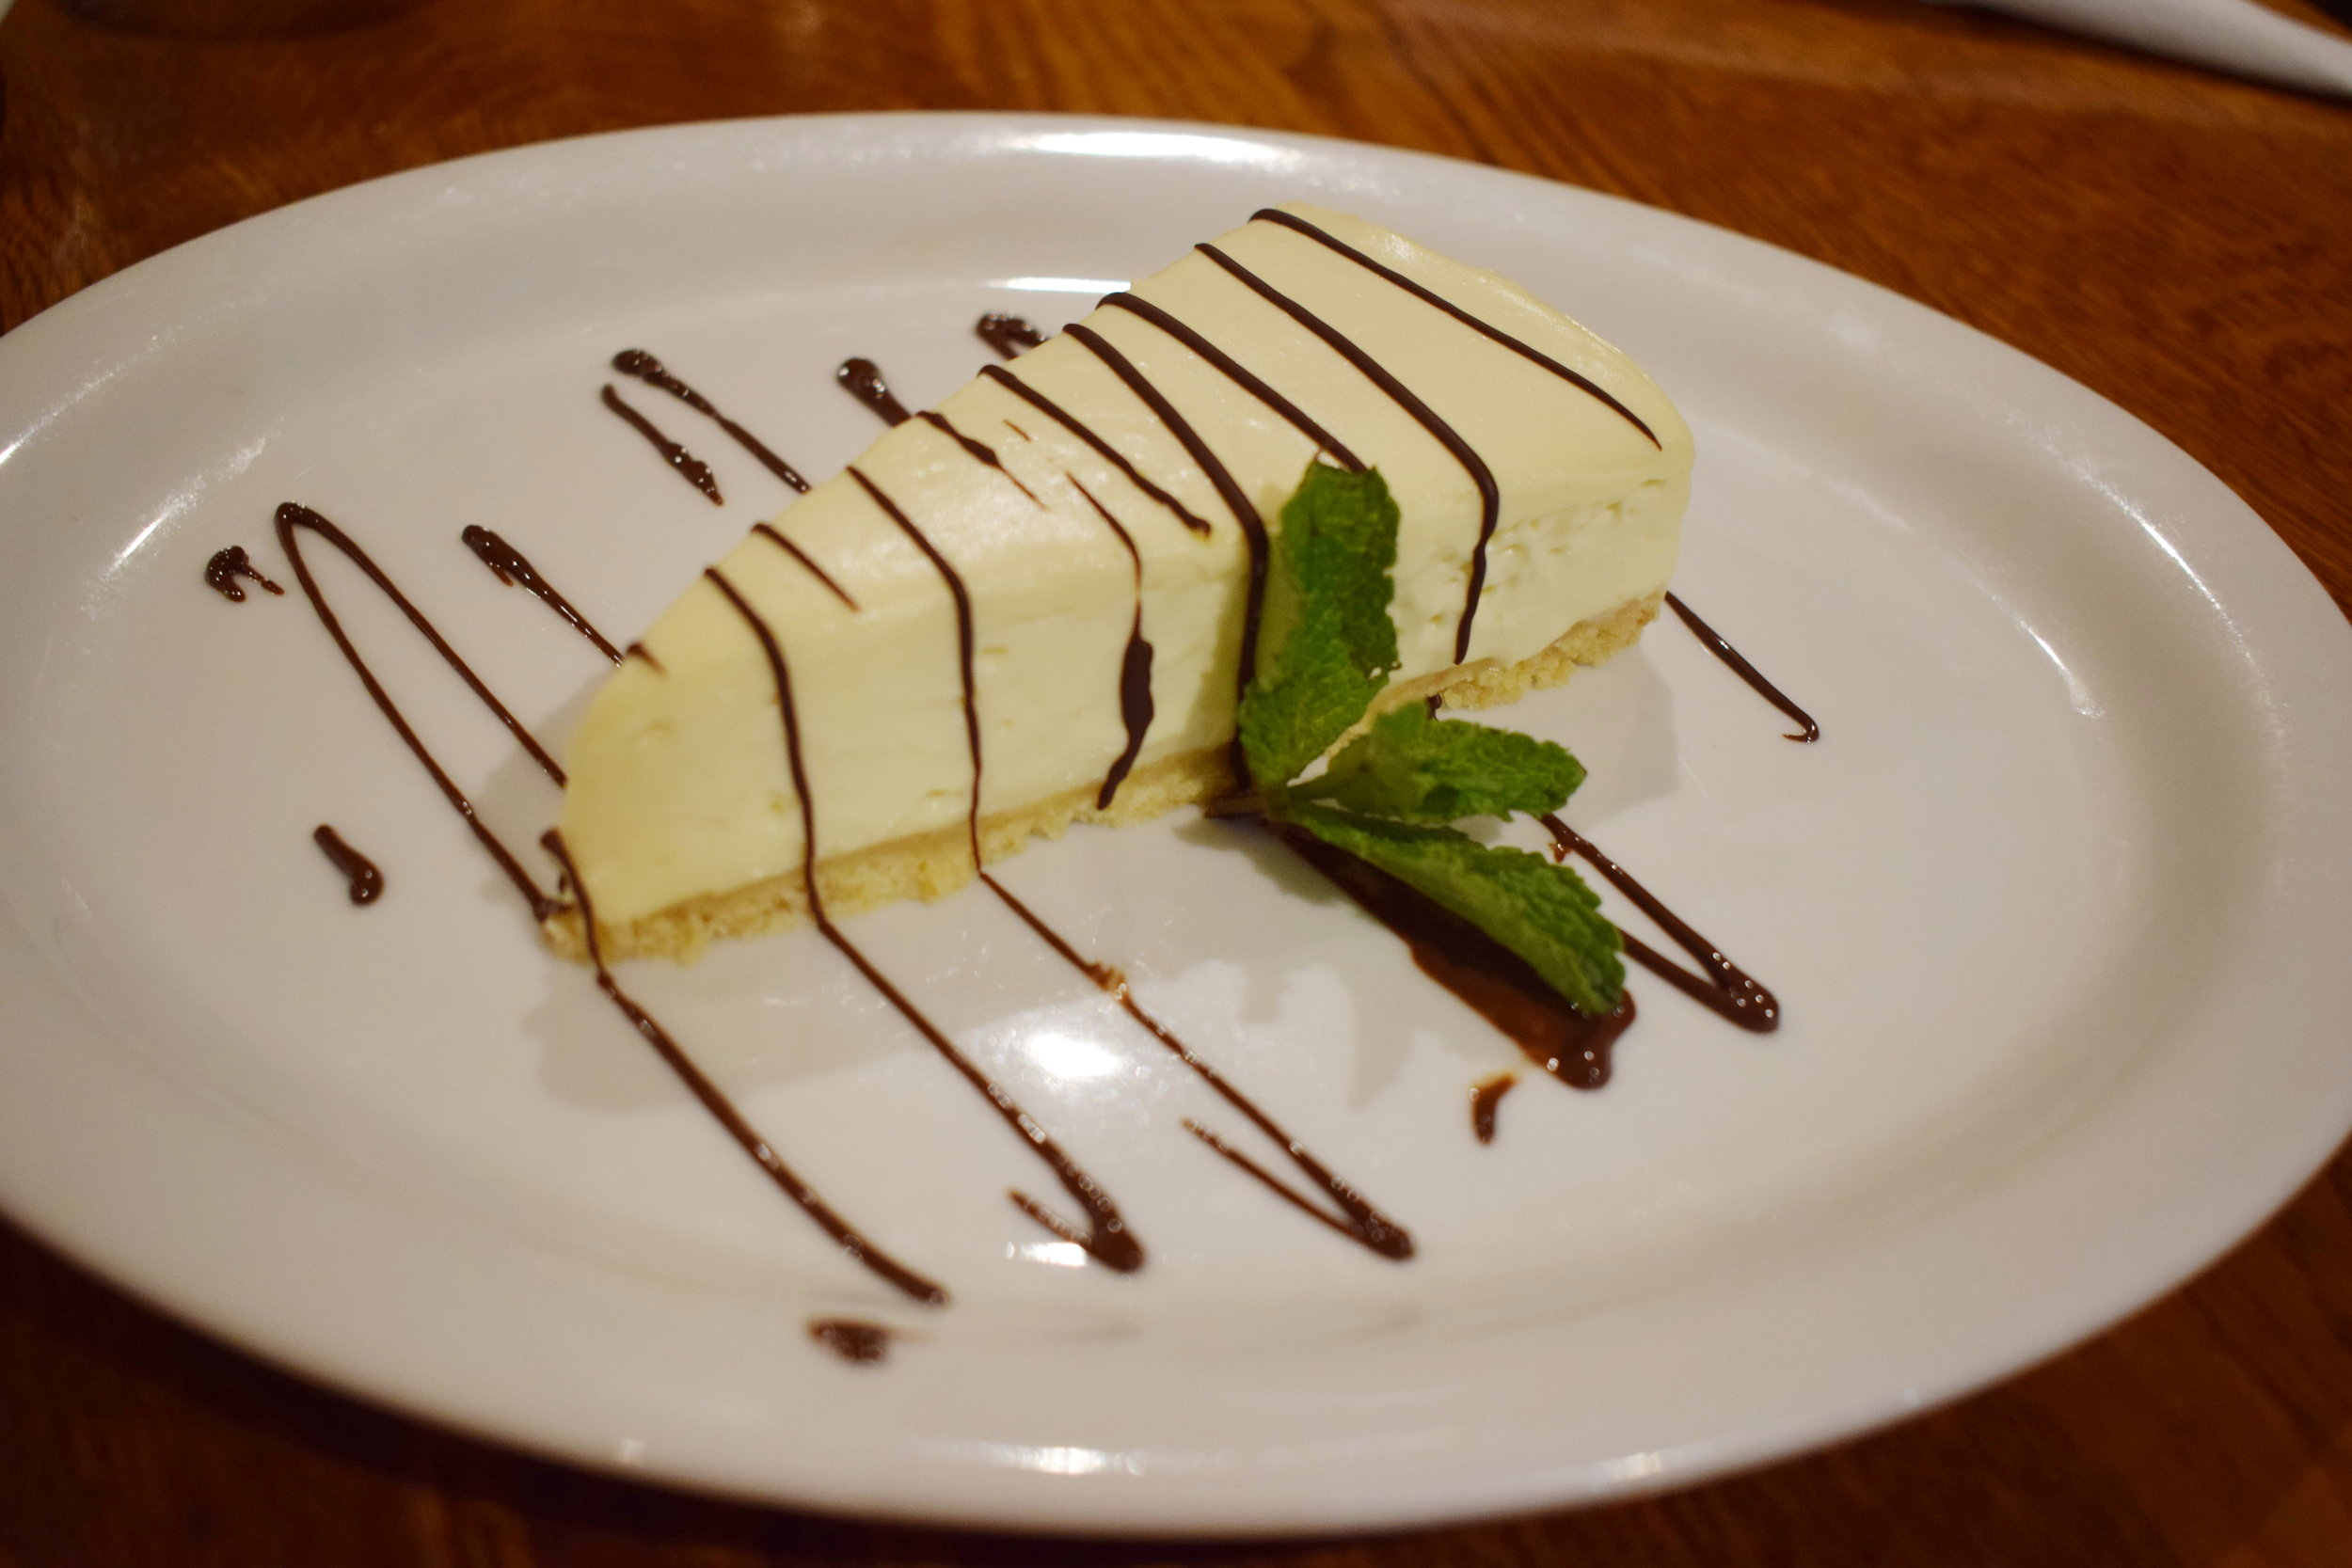 The Fox Country Inn Bailey's Cheesecake